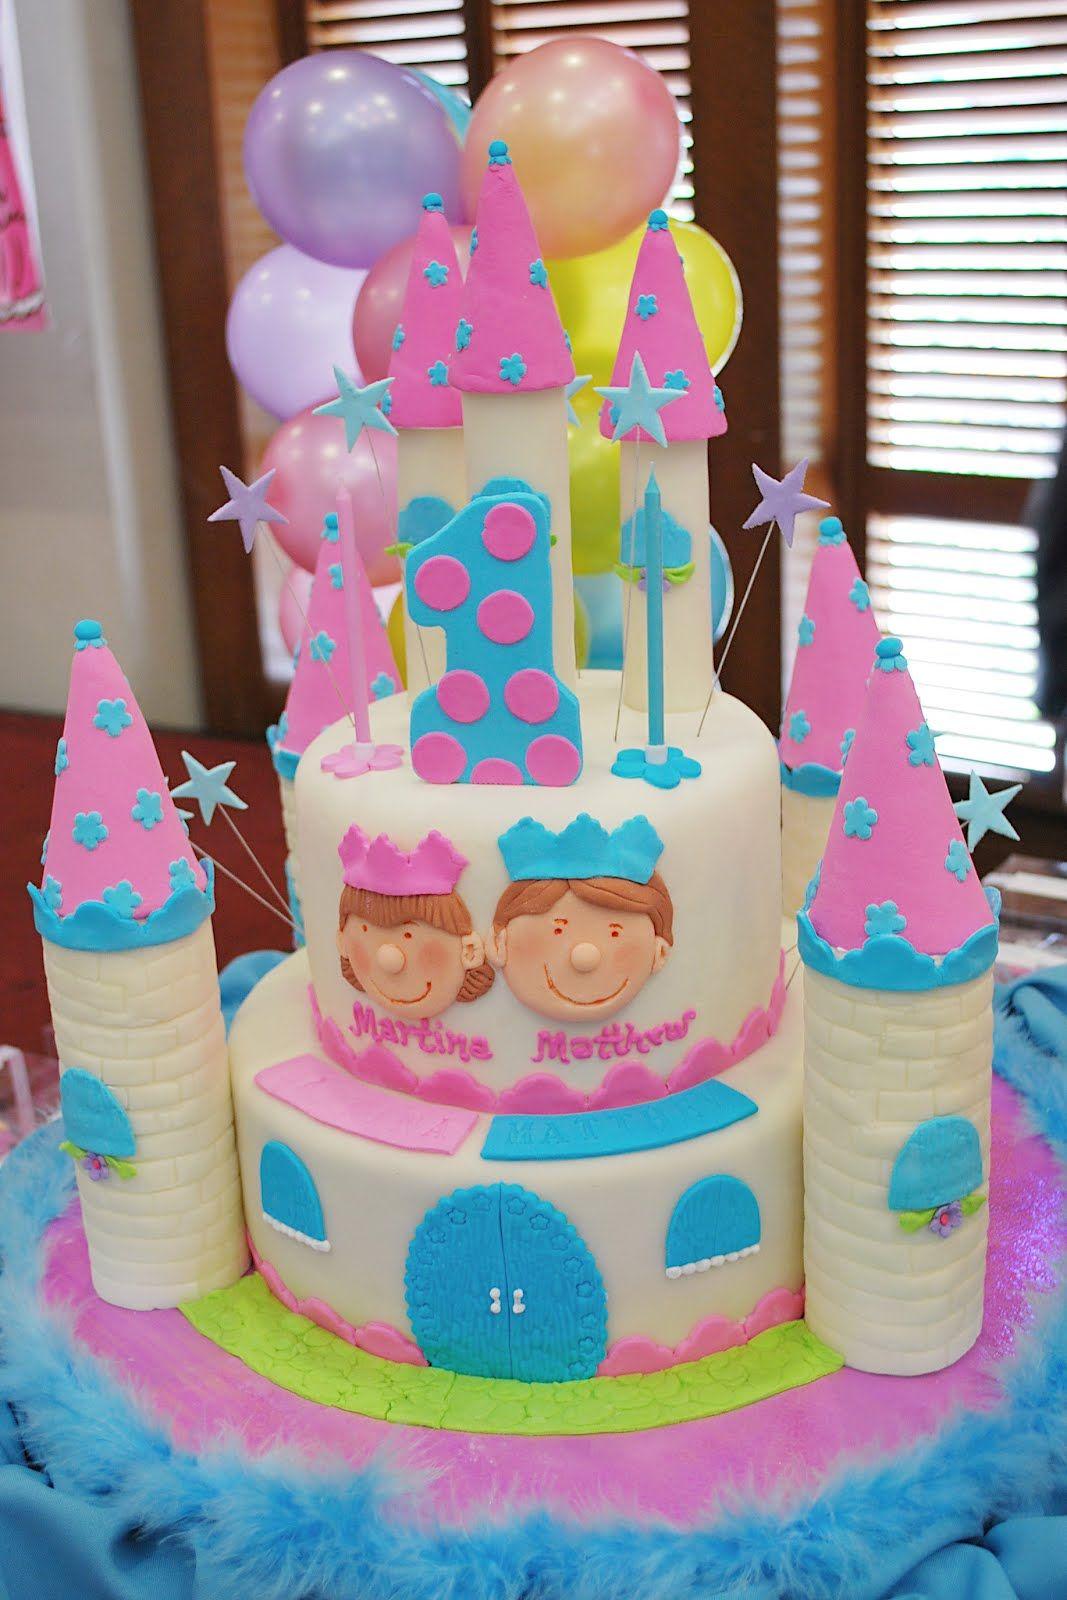 Prince And Princess Birthday Pink Apron S Kitchen Counter